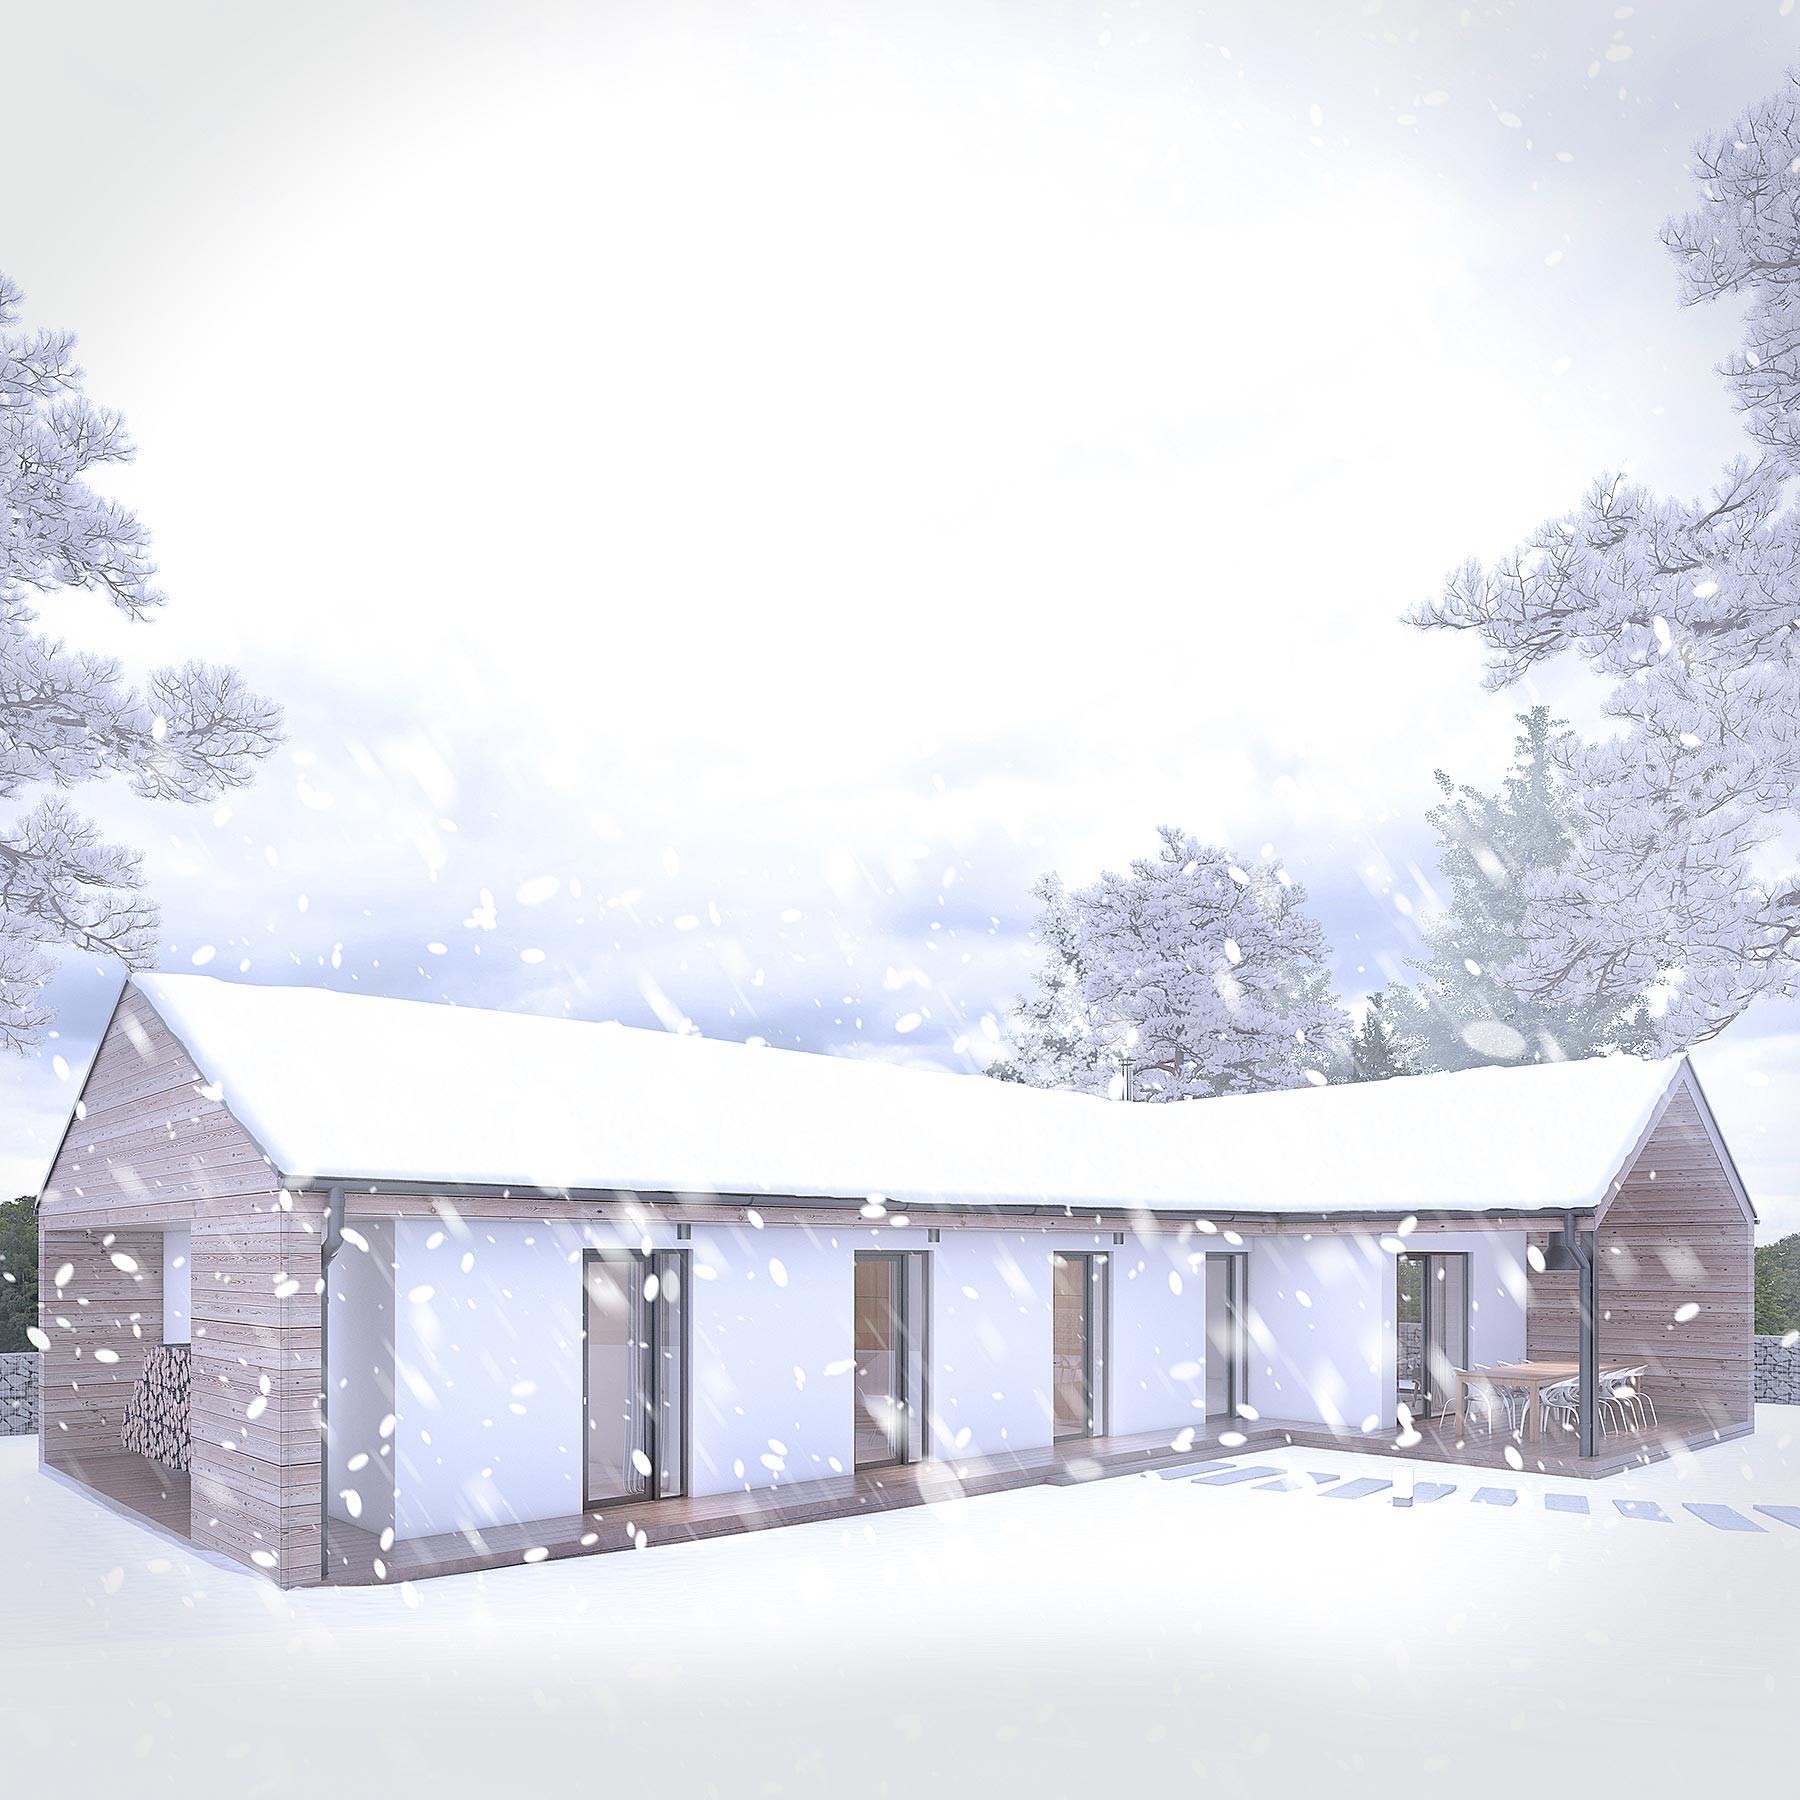 jednopodlazni_moderni_rodinny_dum_se_sikmou_strechou_dream_homes_plavec_winter